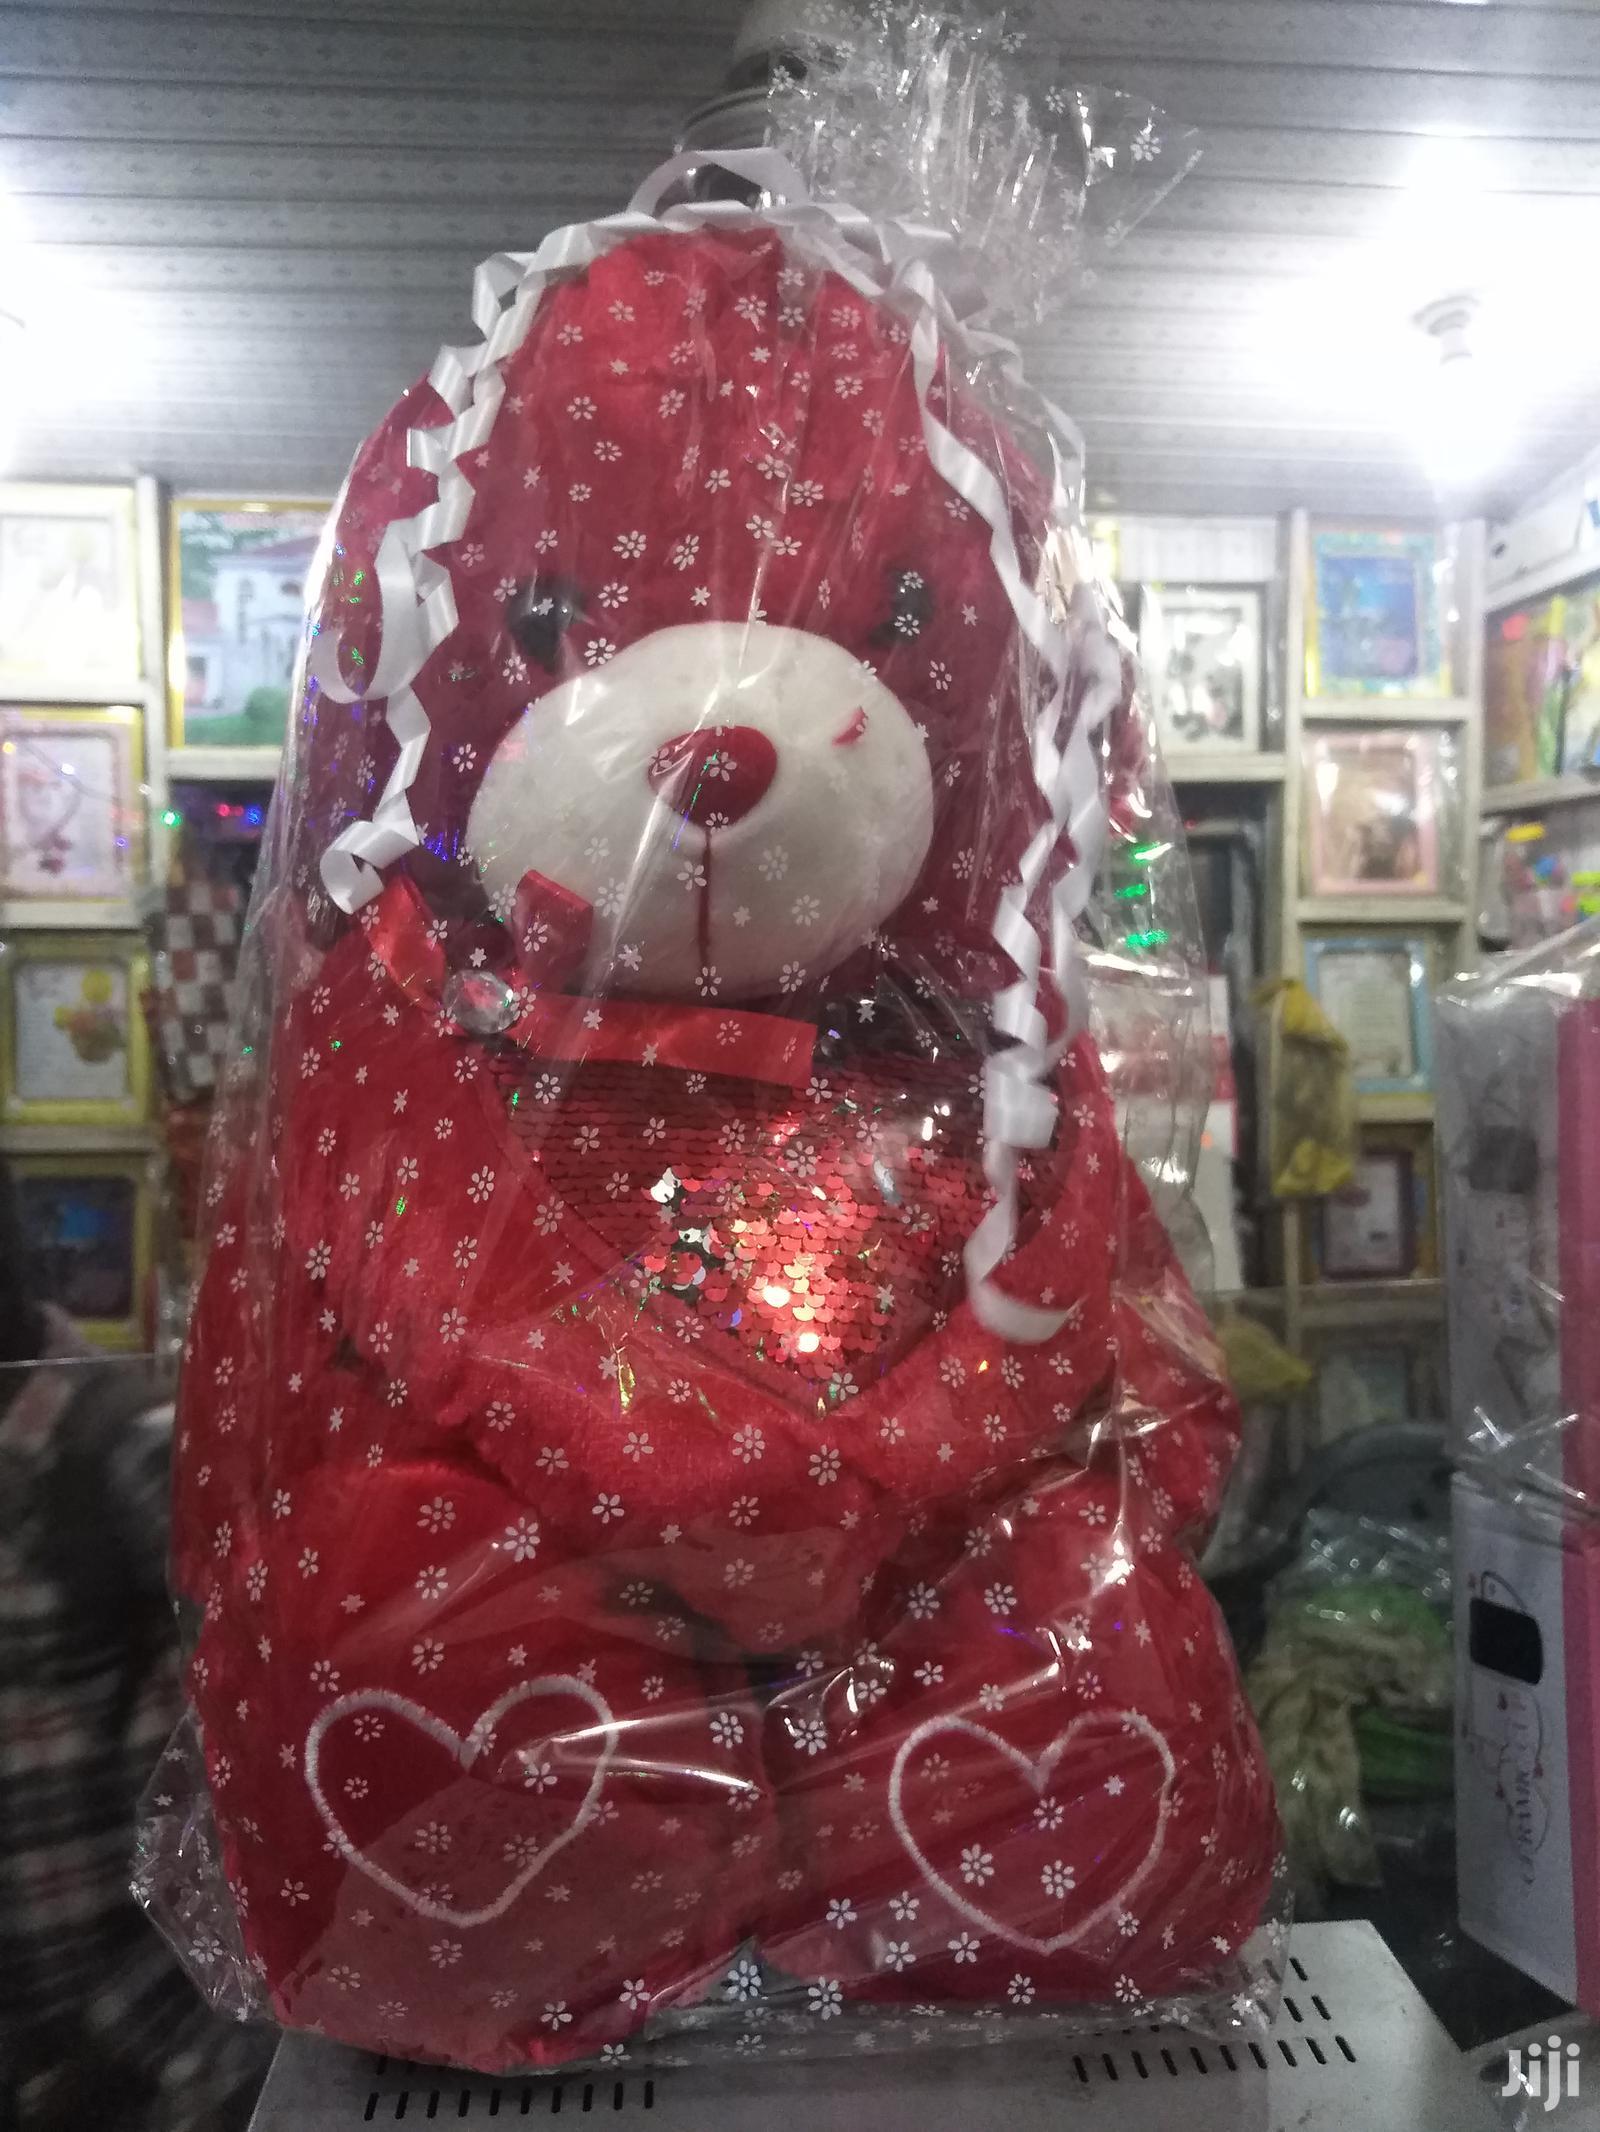 Hay Hay Chicken Stuffed Animal, Big Red Fluffy Teddy Bear In Kwashieman Toys Deborah Palm Jiji Com Gh For Sale In Kwashieman Deborah Palm On Jiji Com Gh